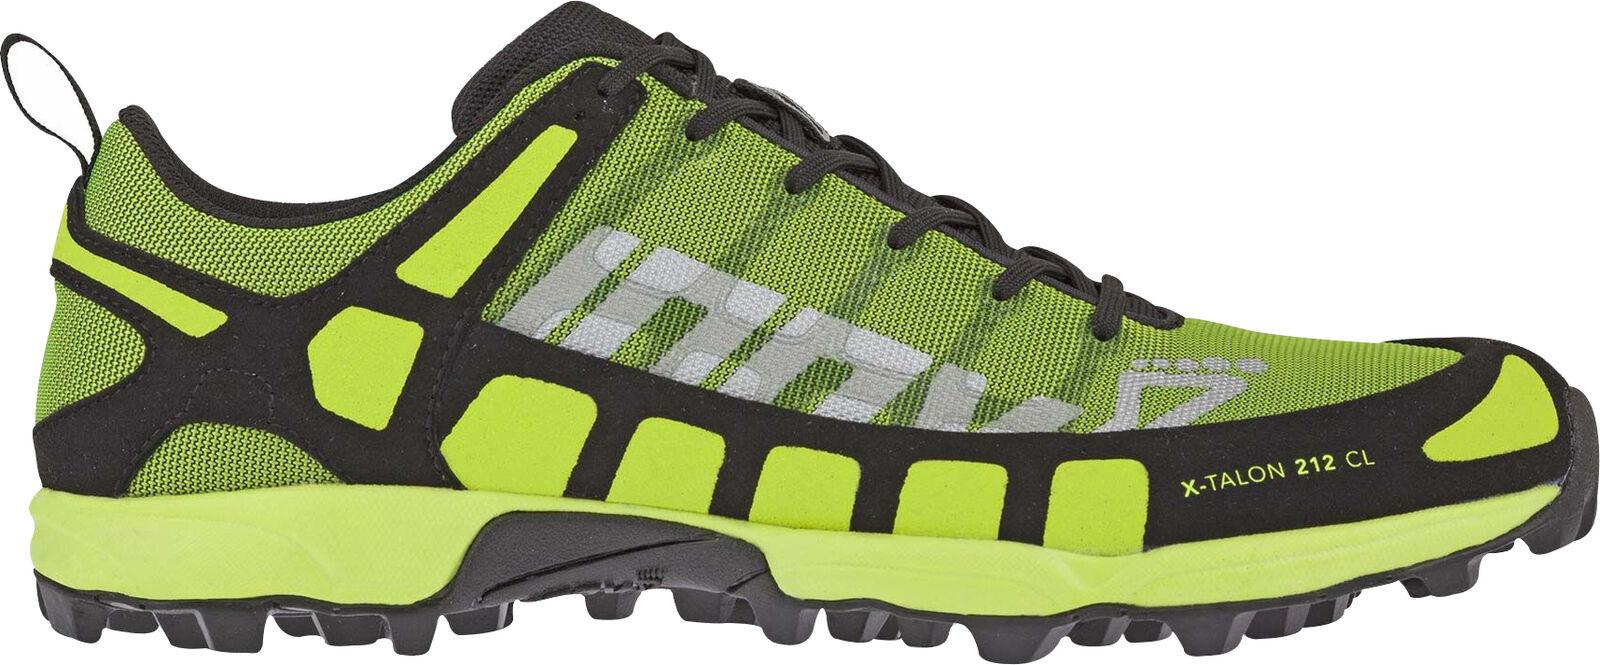 Inov8 X-Talon 212 Classic Mens Trail Running schuhe - Gelb    | Neueste Technologie